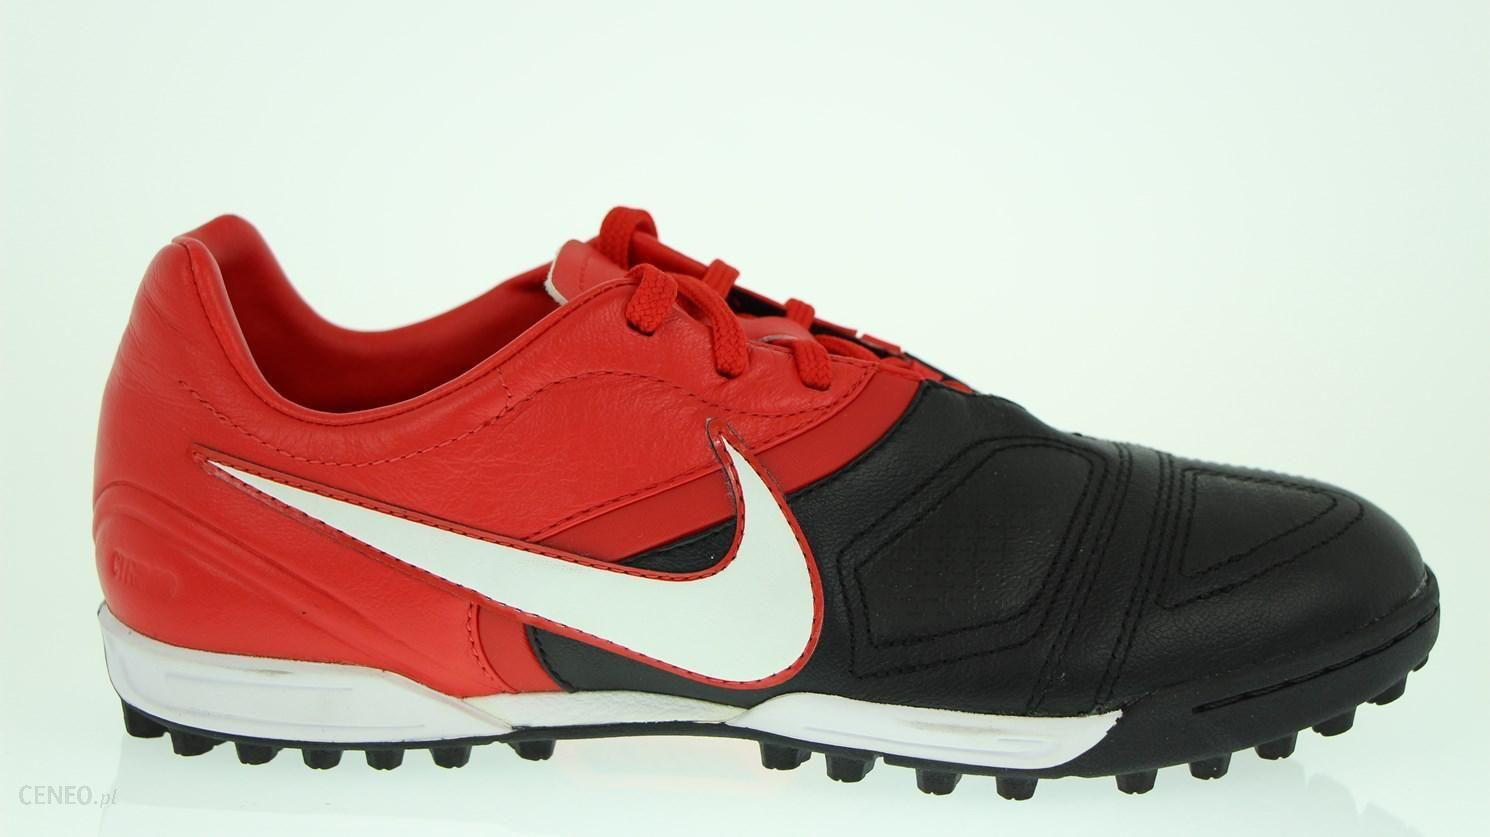 reputable site c5df0 5163b BUTY Nike JR CTR360 LIBRETTO TF (366235-016) - Ceny i opinie - www ...